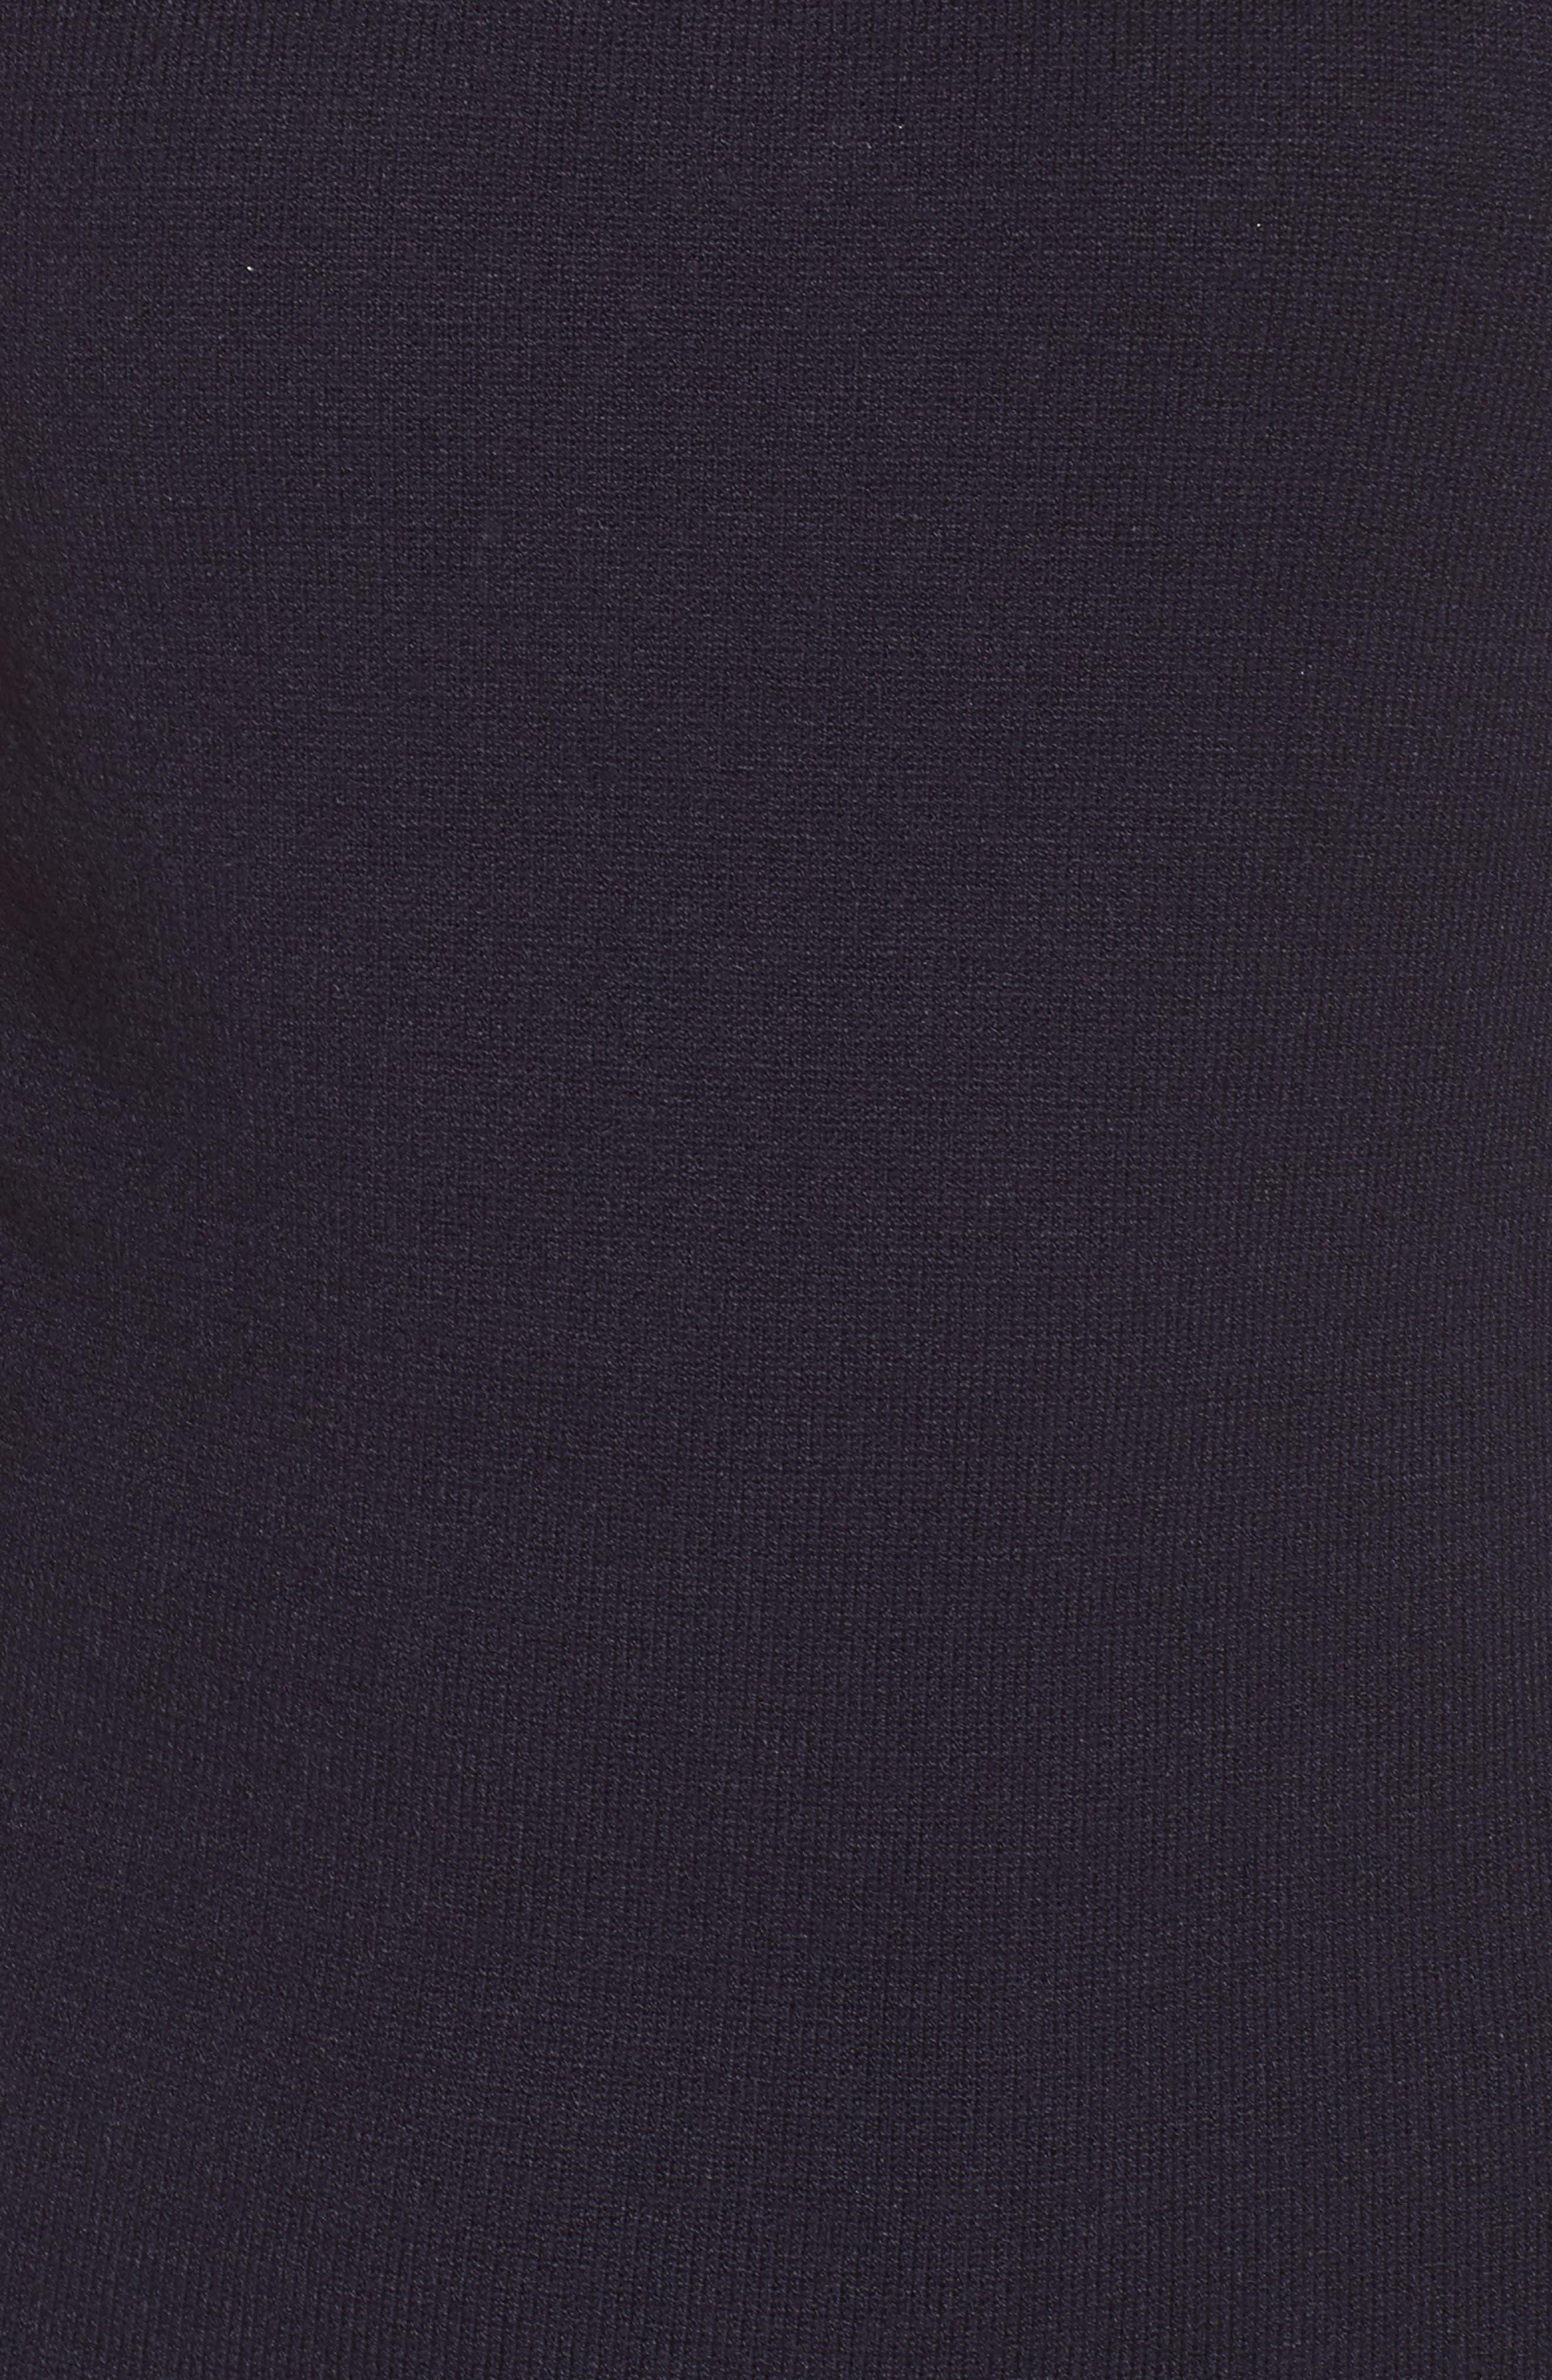 Peplum Hem Sweater Dress,                             Alternate thumbnail 5, color,                             410